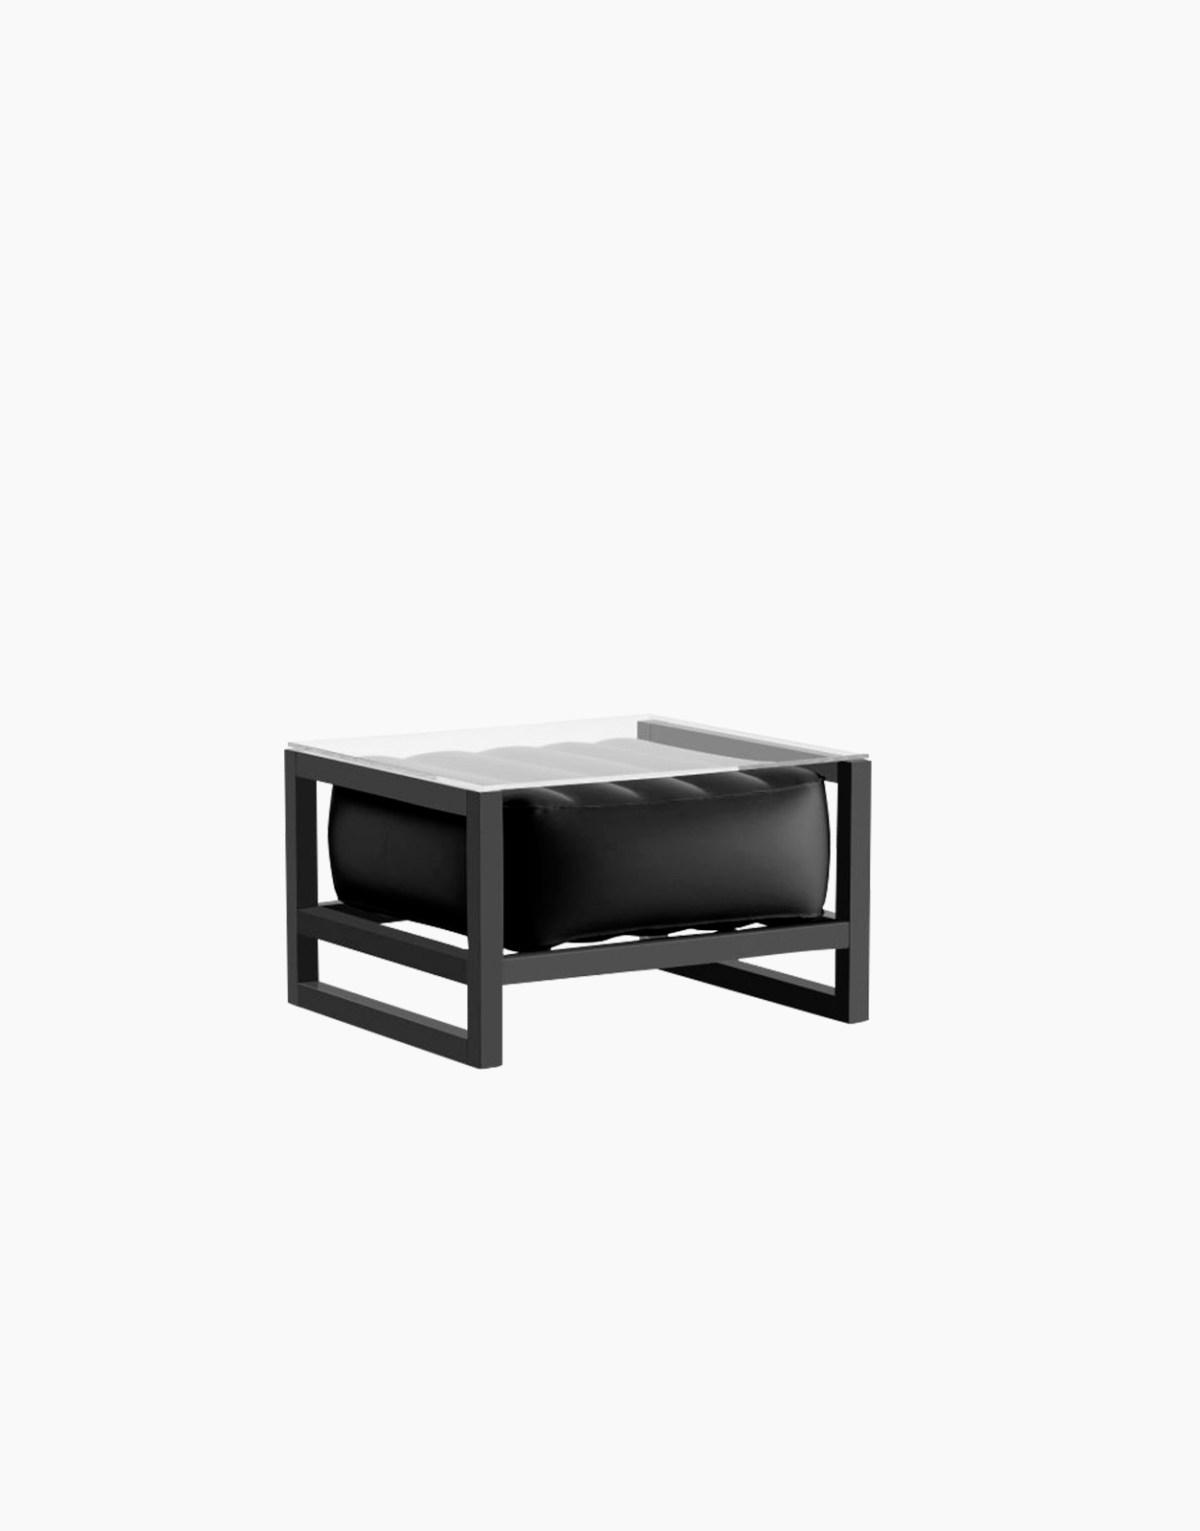 Revendeur de Mojow solution design fr mobilier table basse Yoko noir opaque